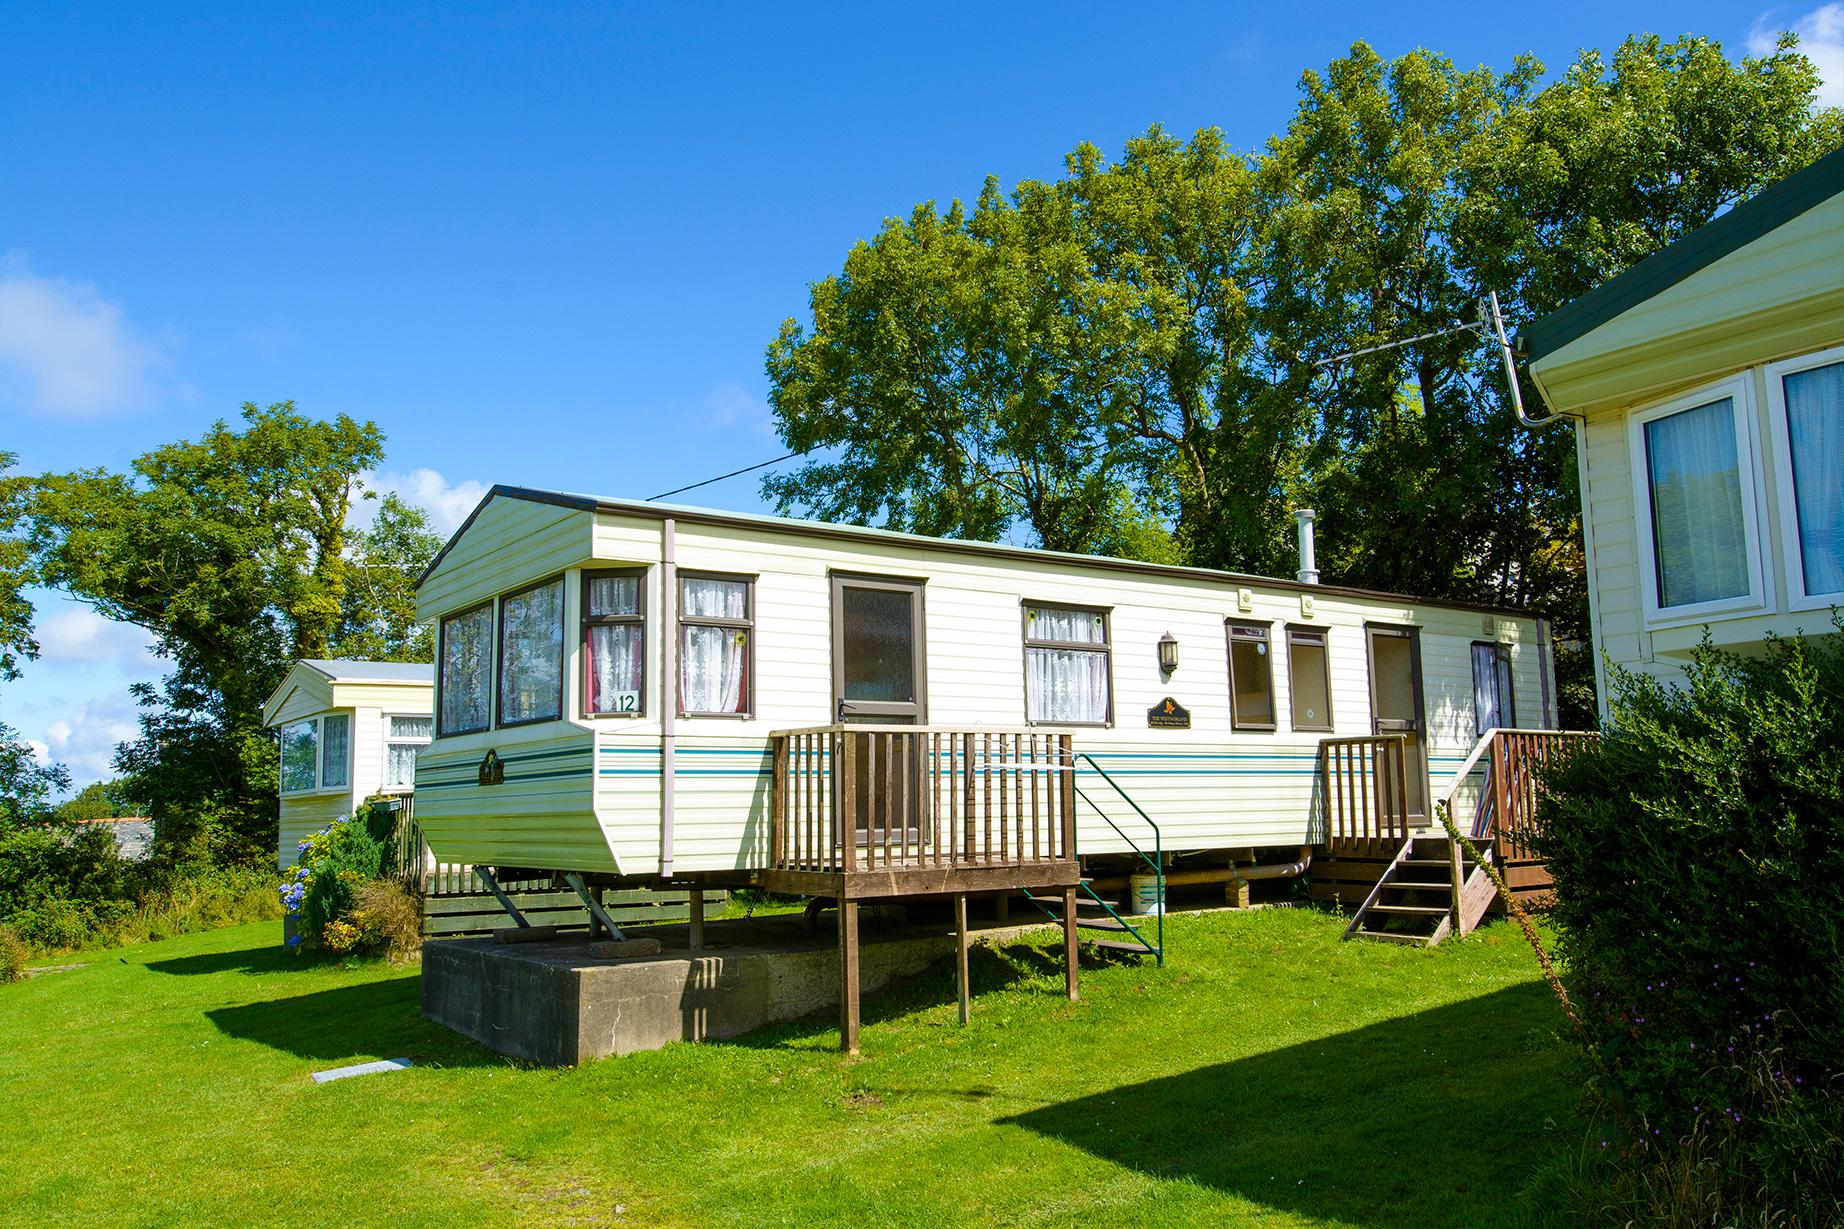 North Devon Holiday Homes